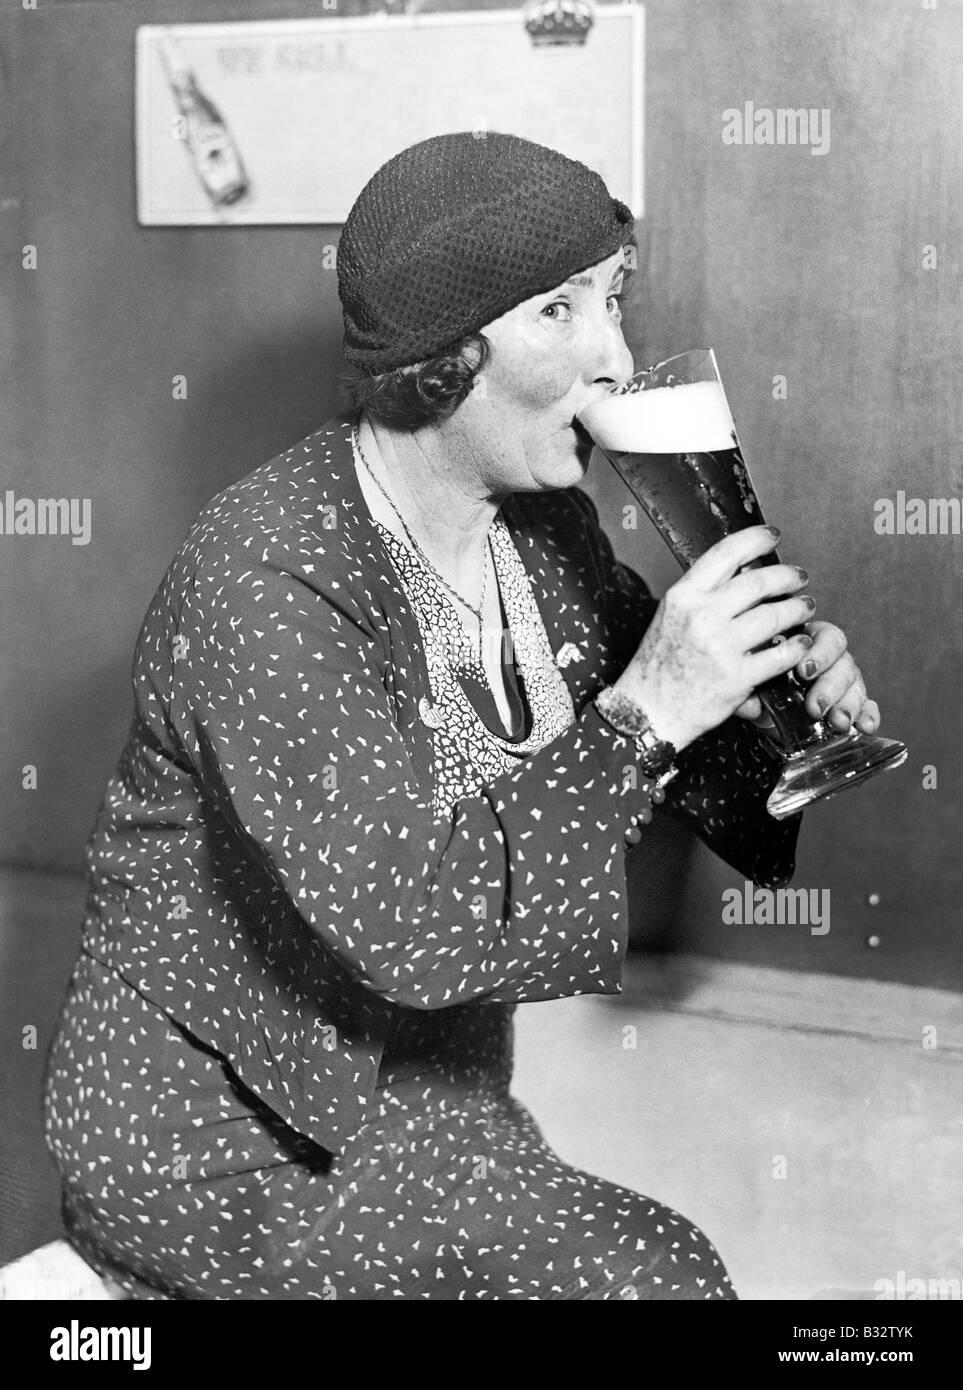 Frau aus ein großes Bierglas trinken Stockbild